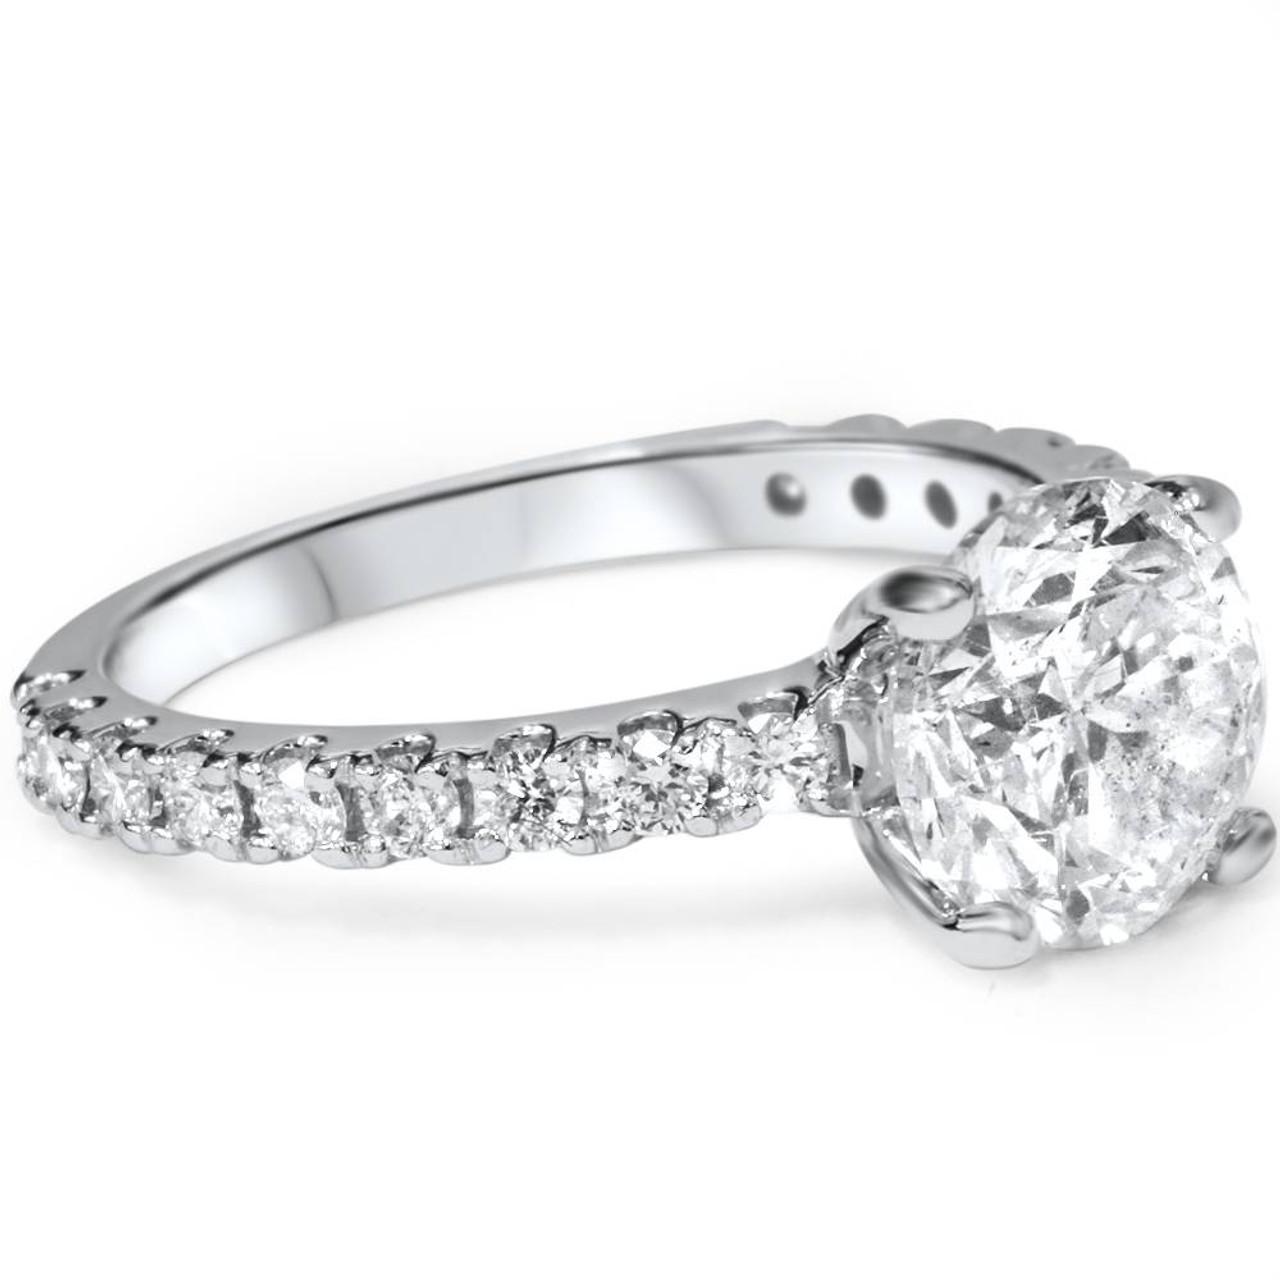 3 Carat Diamond Engagement Solitaire Ring 14K White Gold Enhanced Round Cut  (I/J, I1)